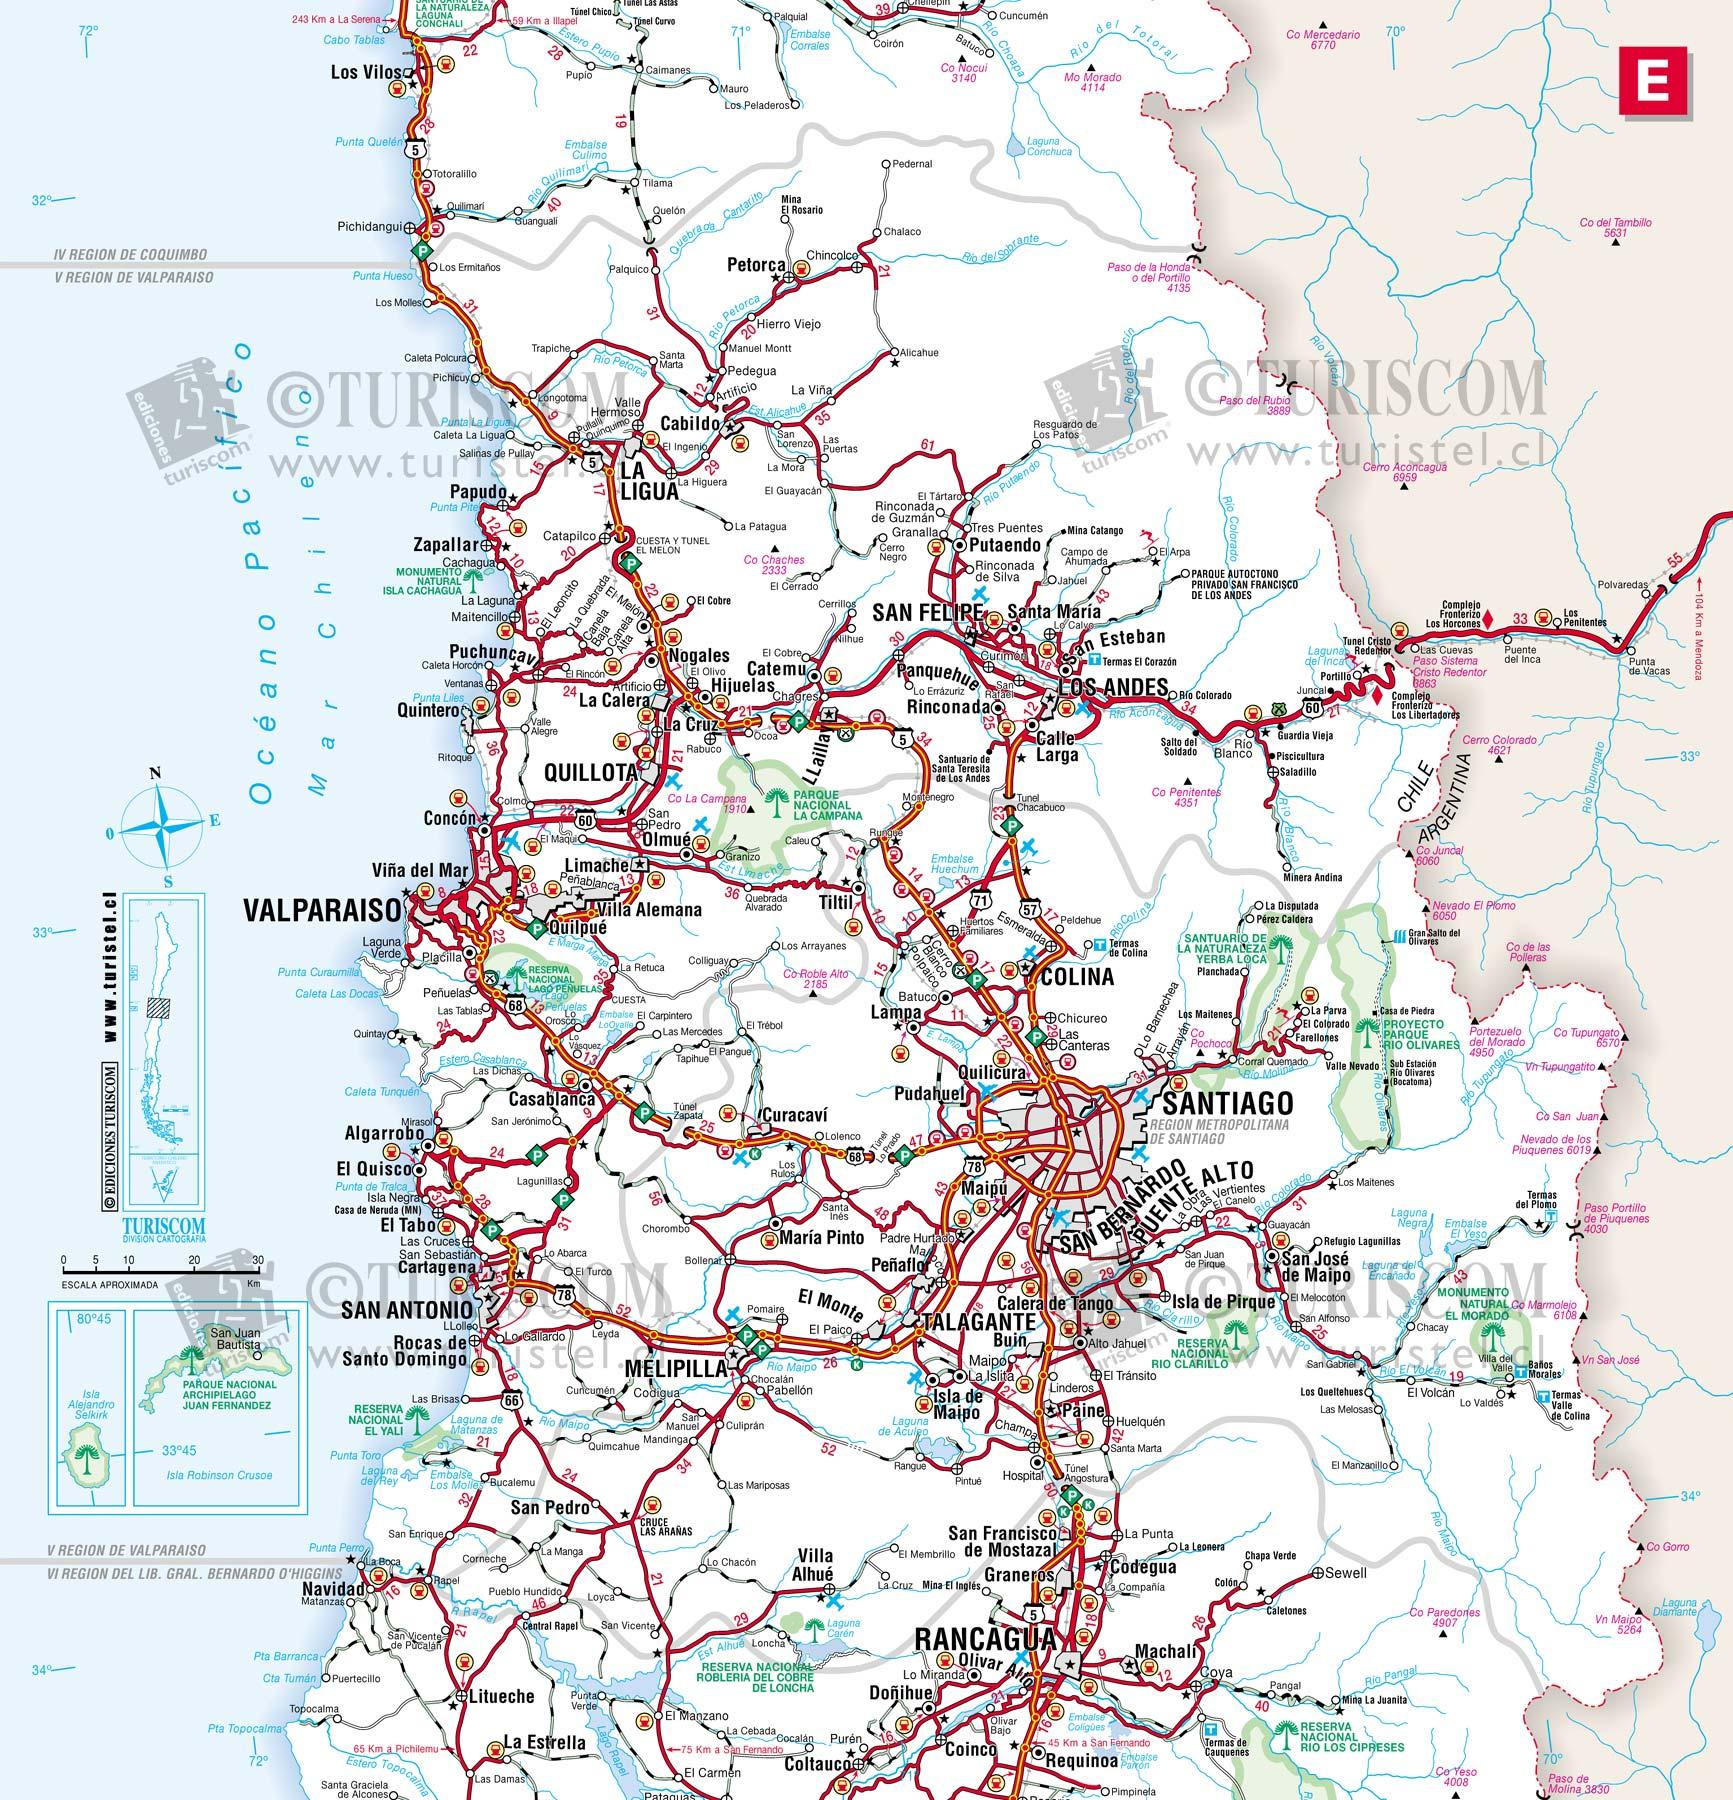 Mapa Rutero Tarapaca Chile